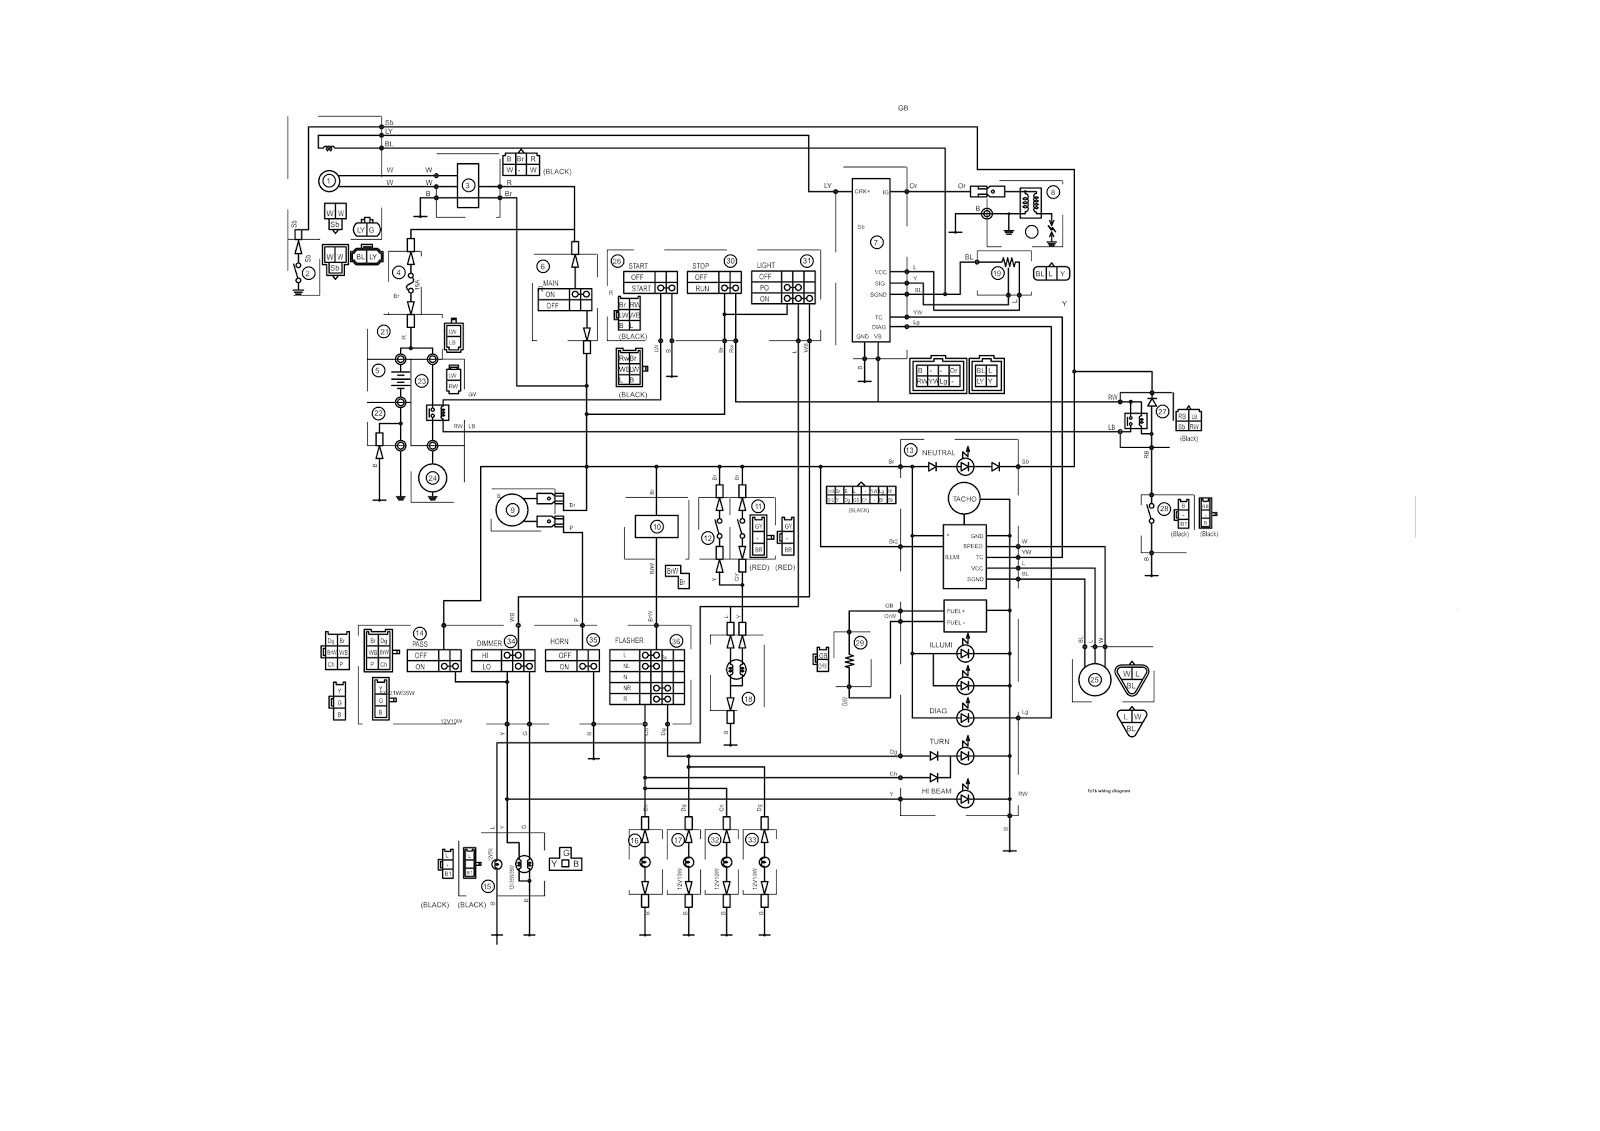 FZ16 (with wiring diagram) | Techy at day, Blogger at noon, and a Hobbyist at night